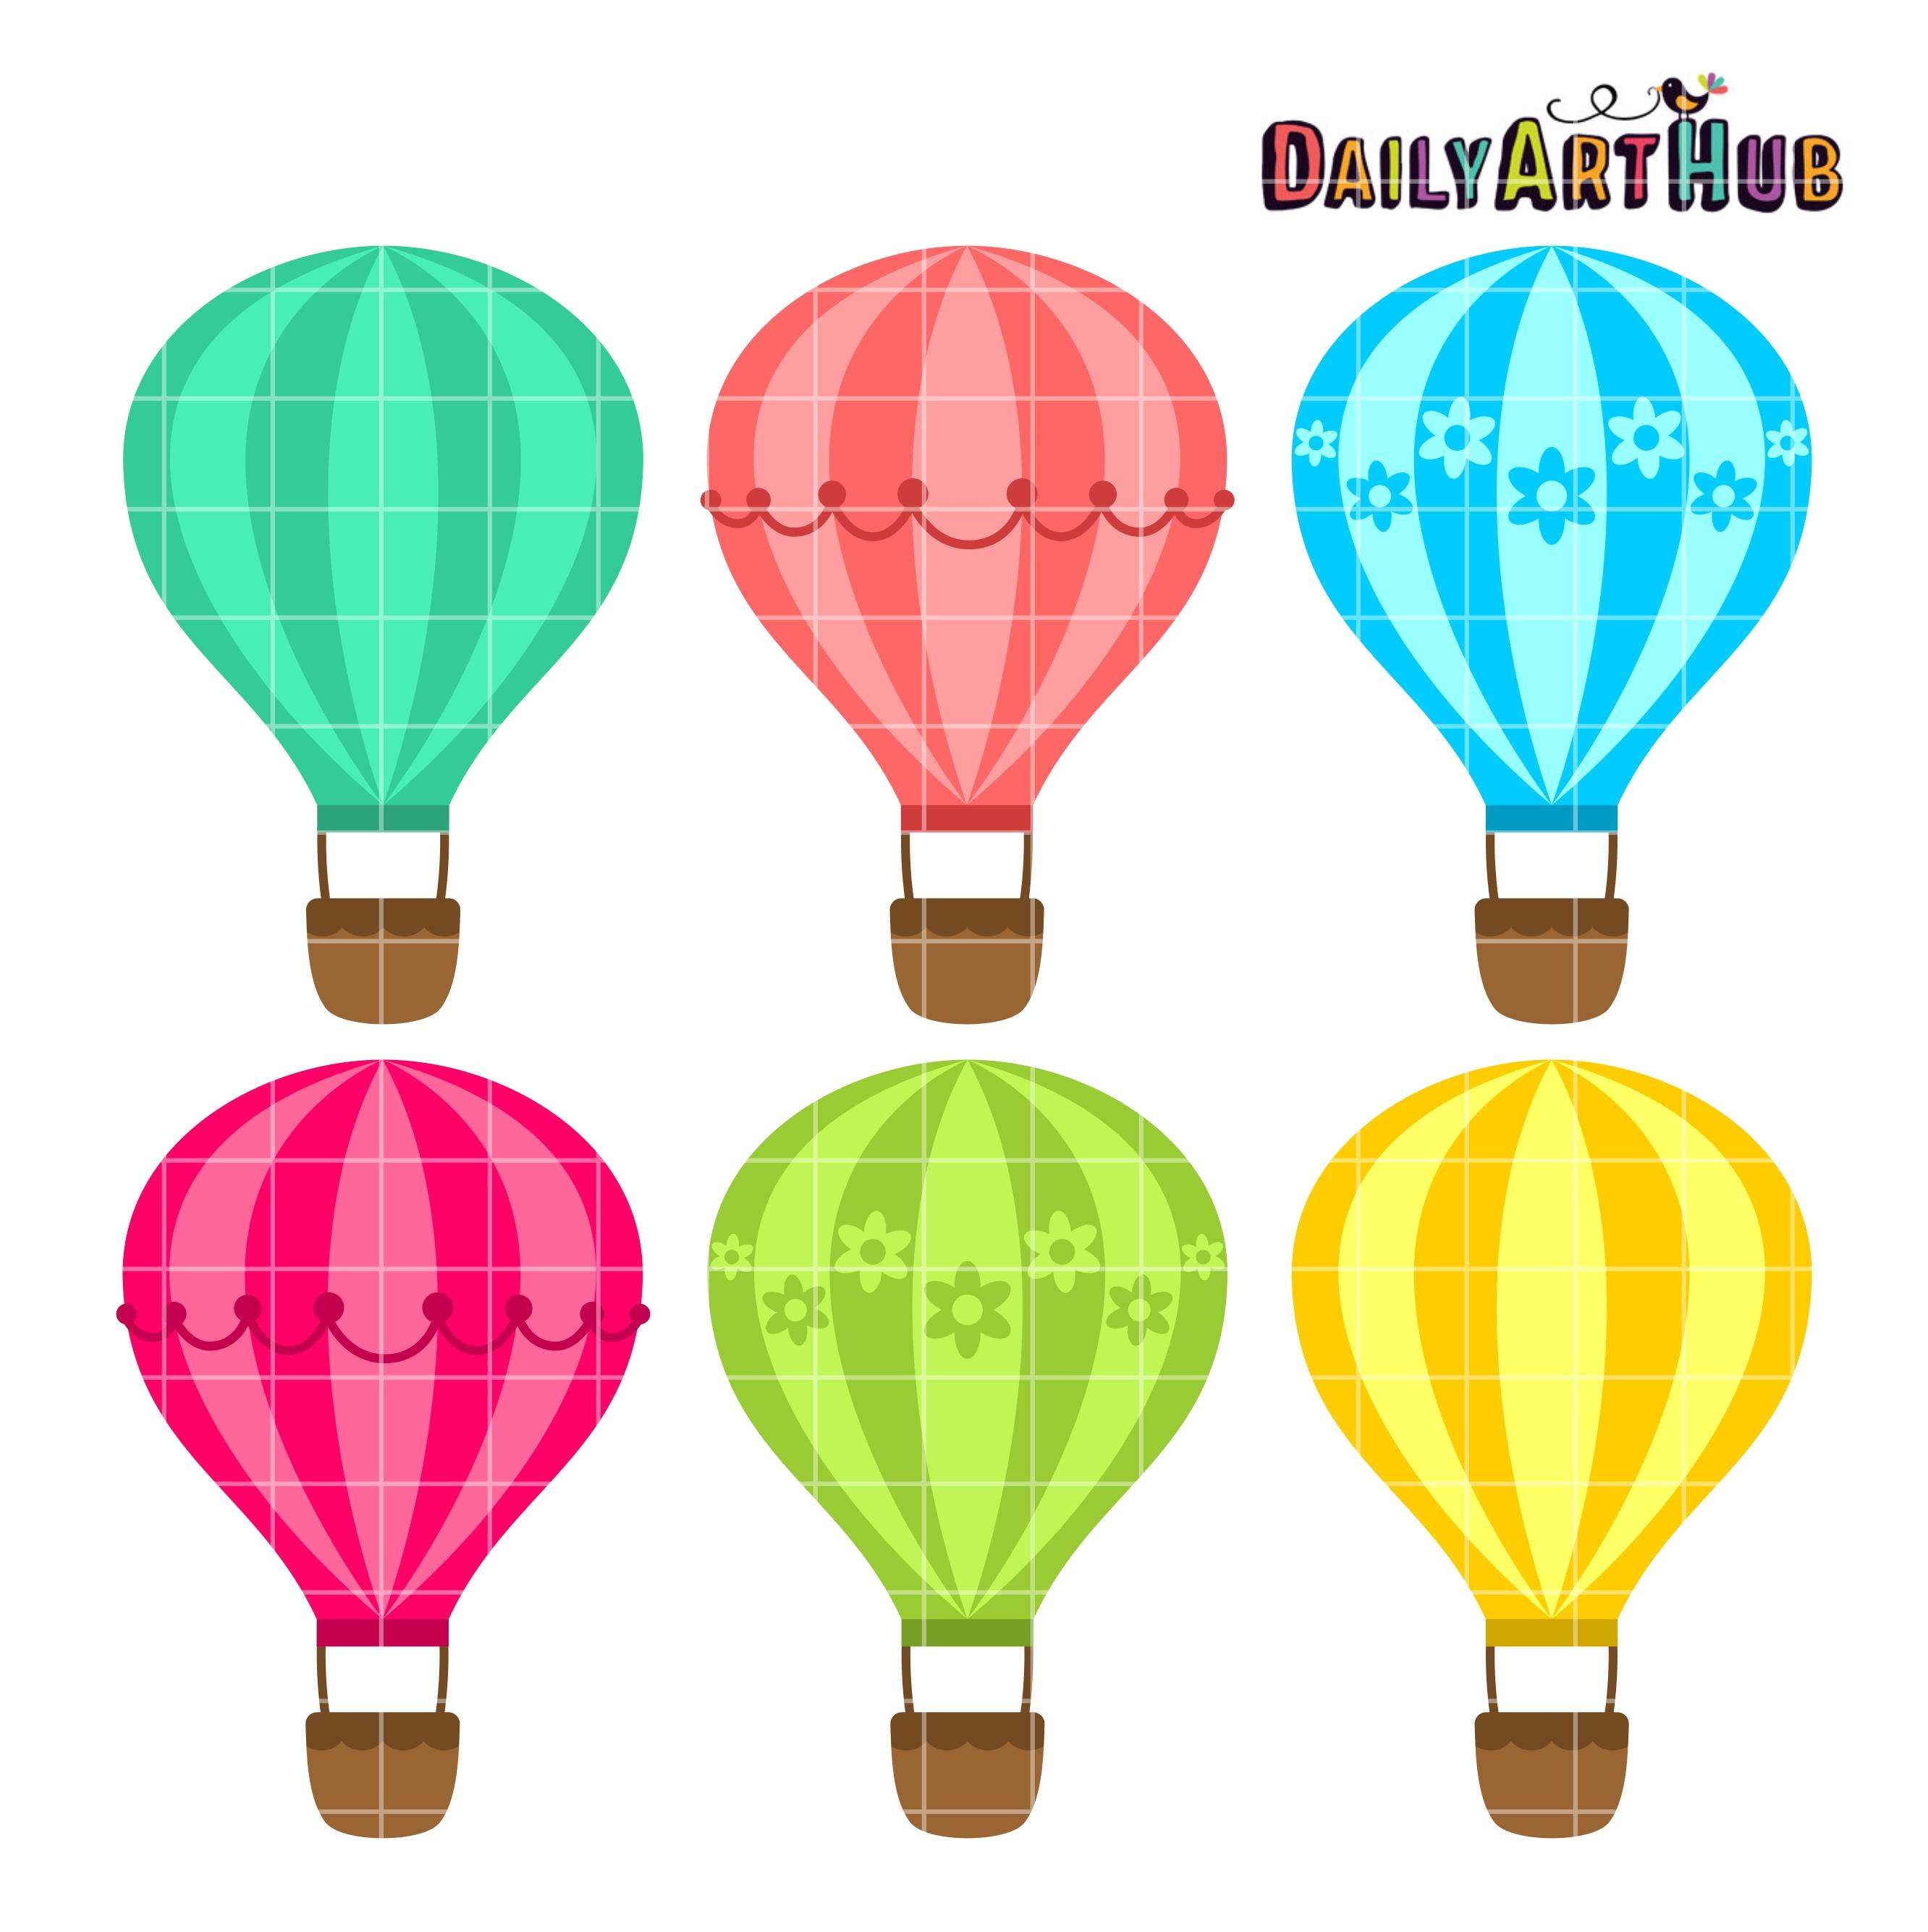 Hot Air Balloons Clip Art Set | Daily Art Hub